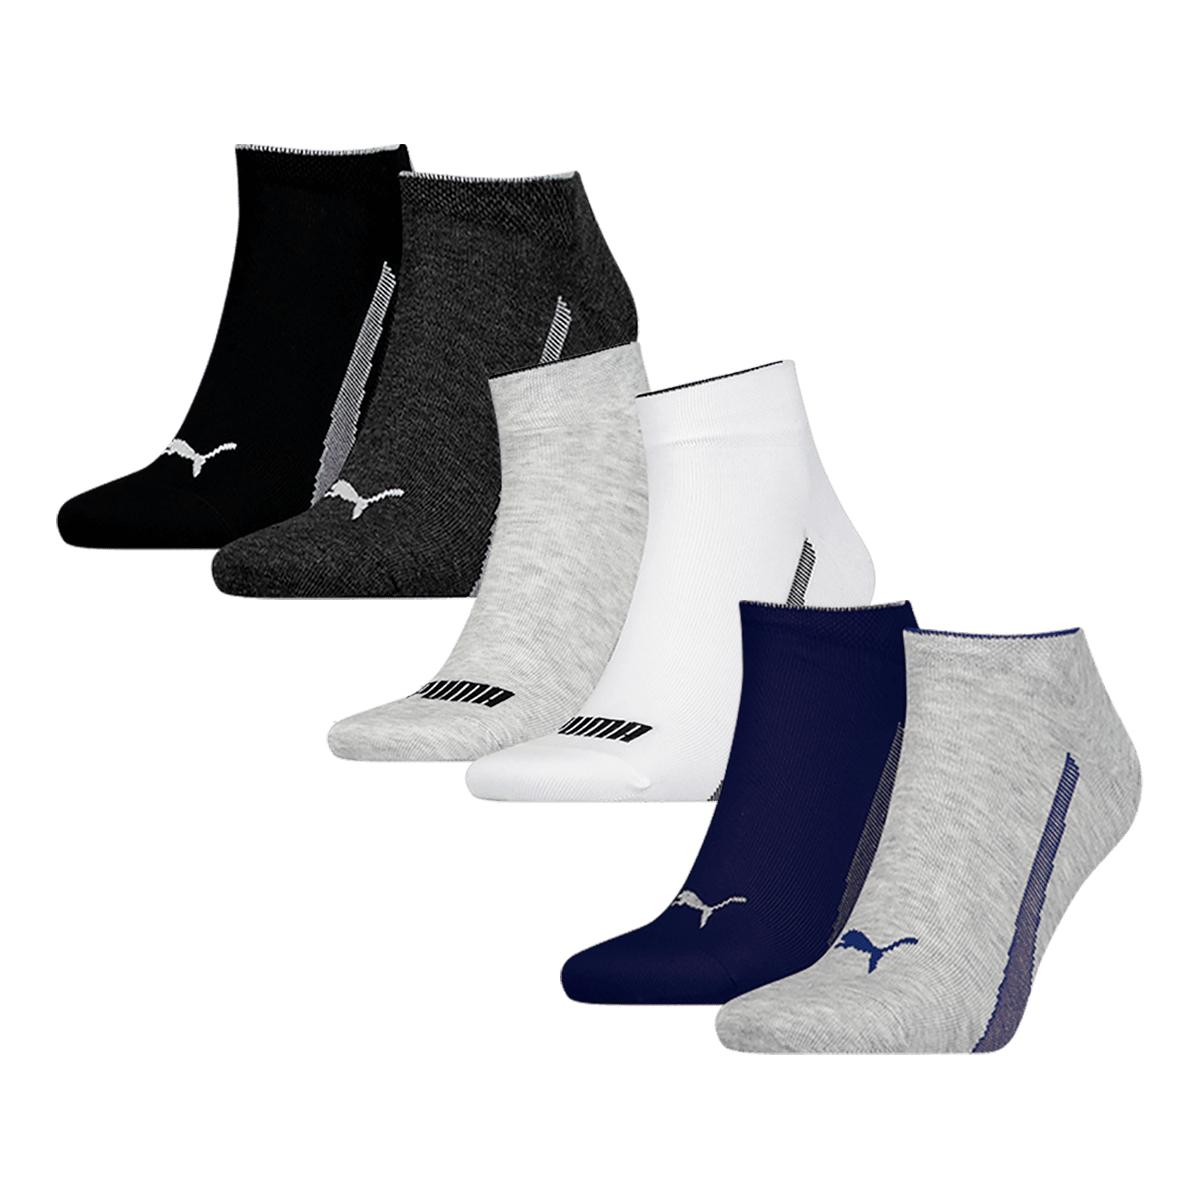 Puma Sneaker Socken 24 Paar (1,37€ Stückpreis, Größen: 39-42, 43-46)